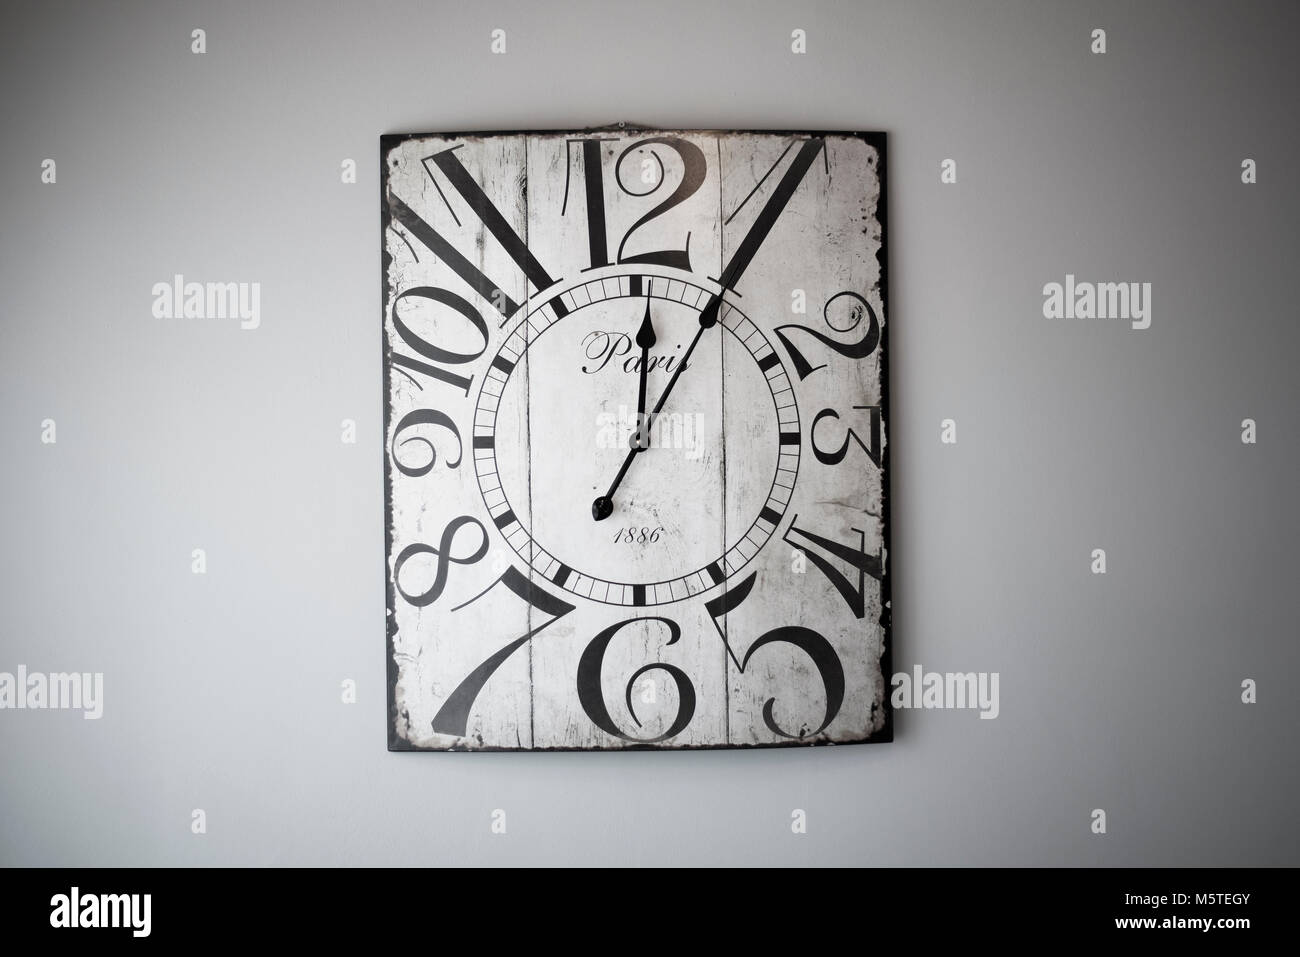 Wooden Wall Clock Stock Photos & Wooden Wall Clock Stock